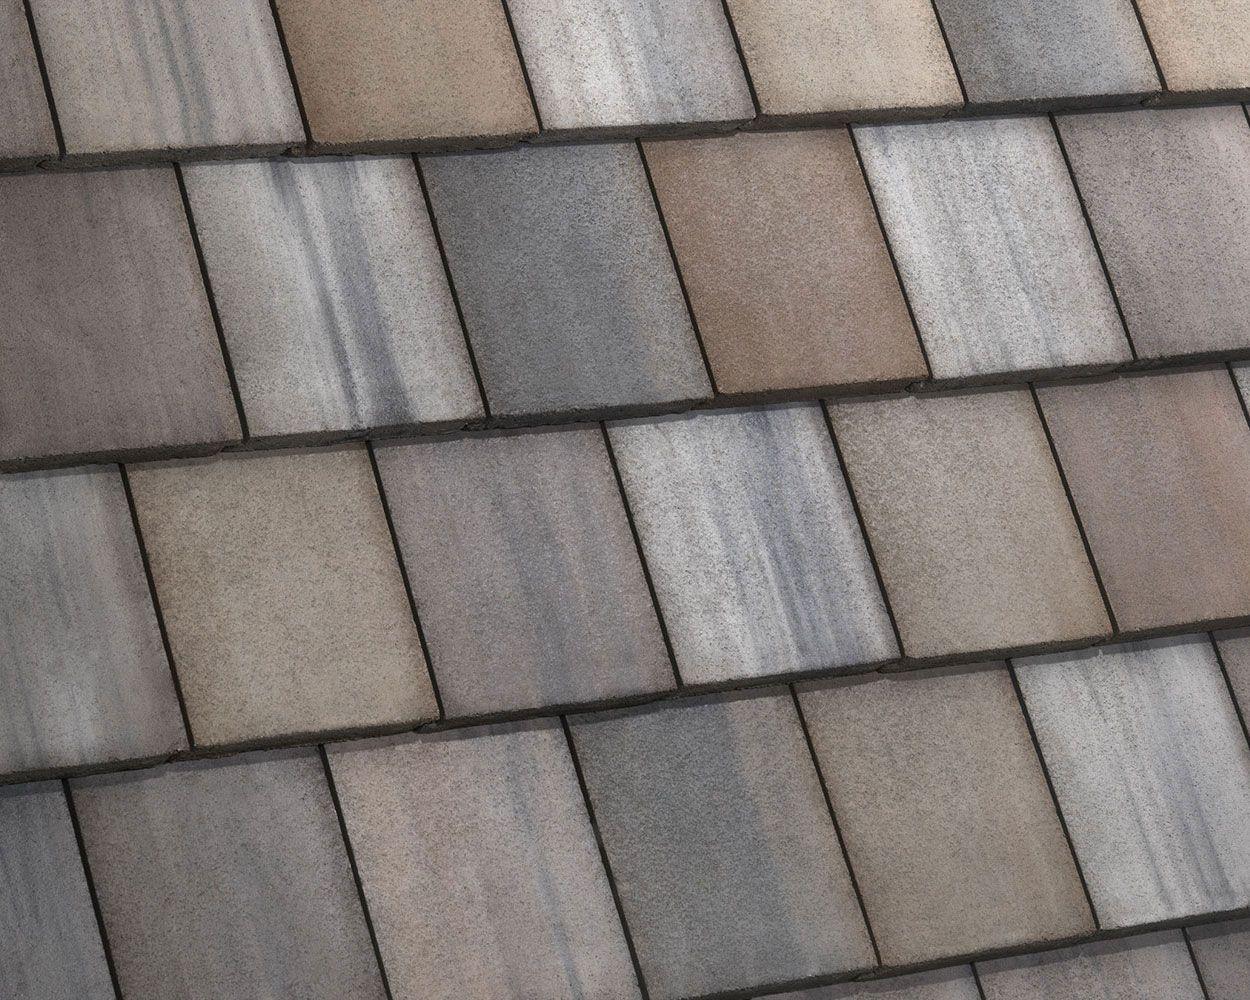 Best Hillsborough Blend Roof Tile We Chose In 2019 Roof 400 x 300